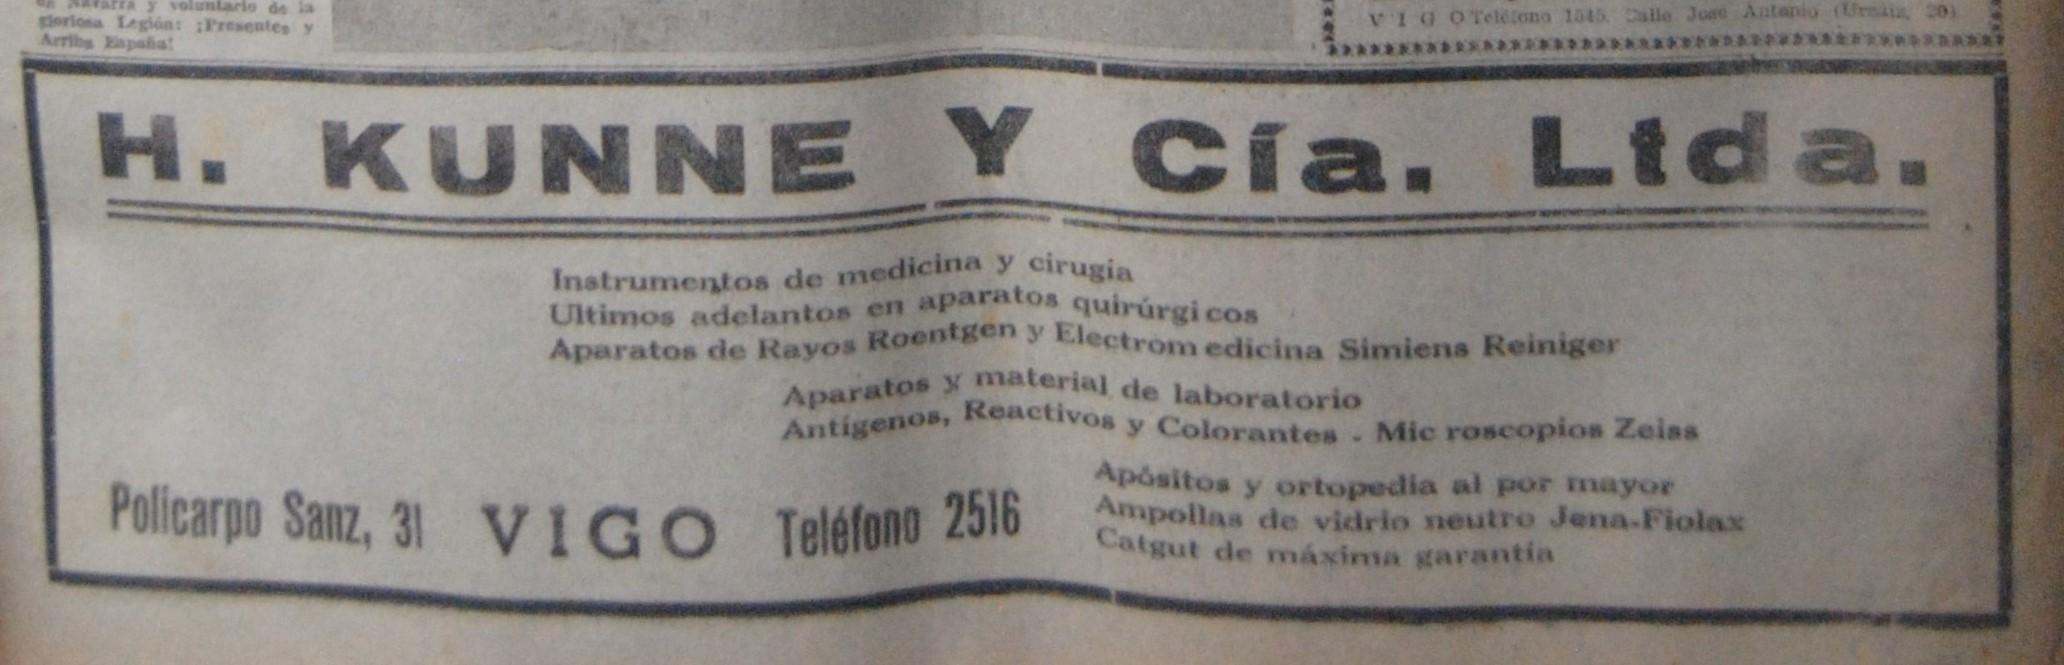 H. Kunne & Cía., comercial medicina